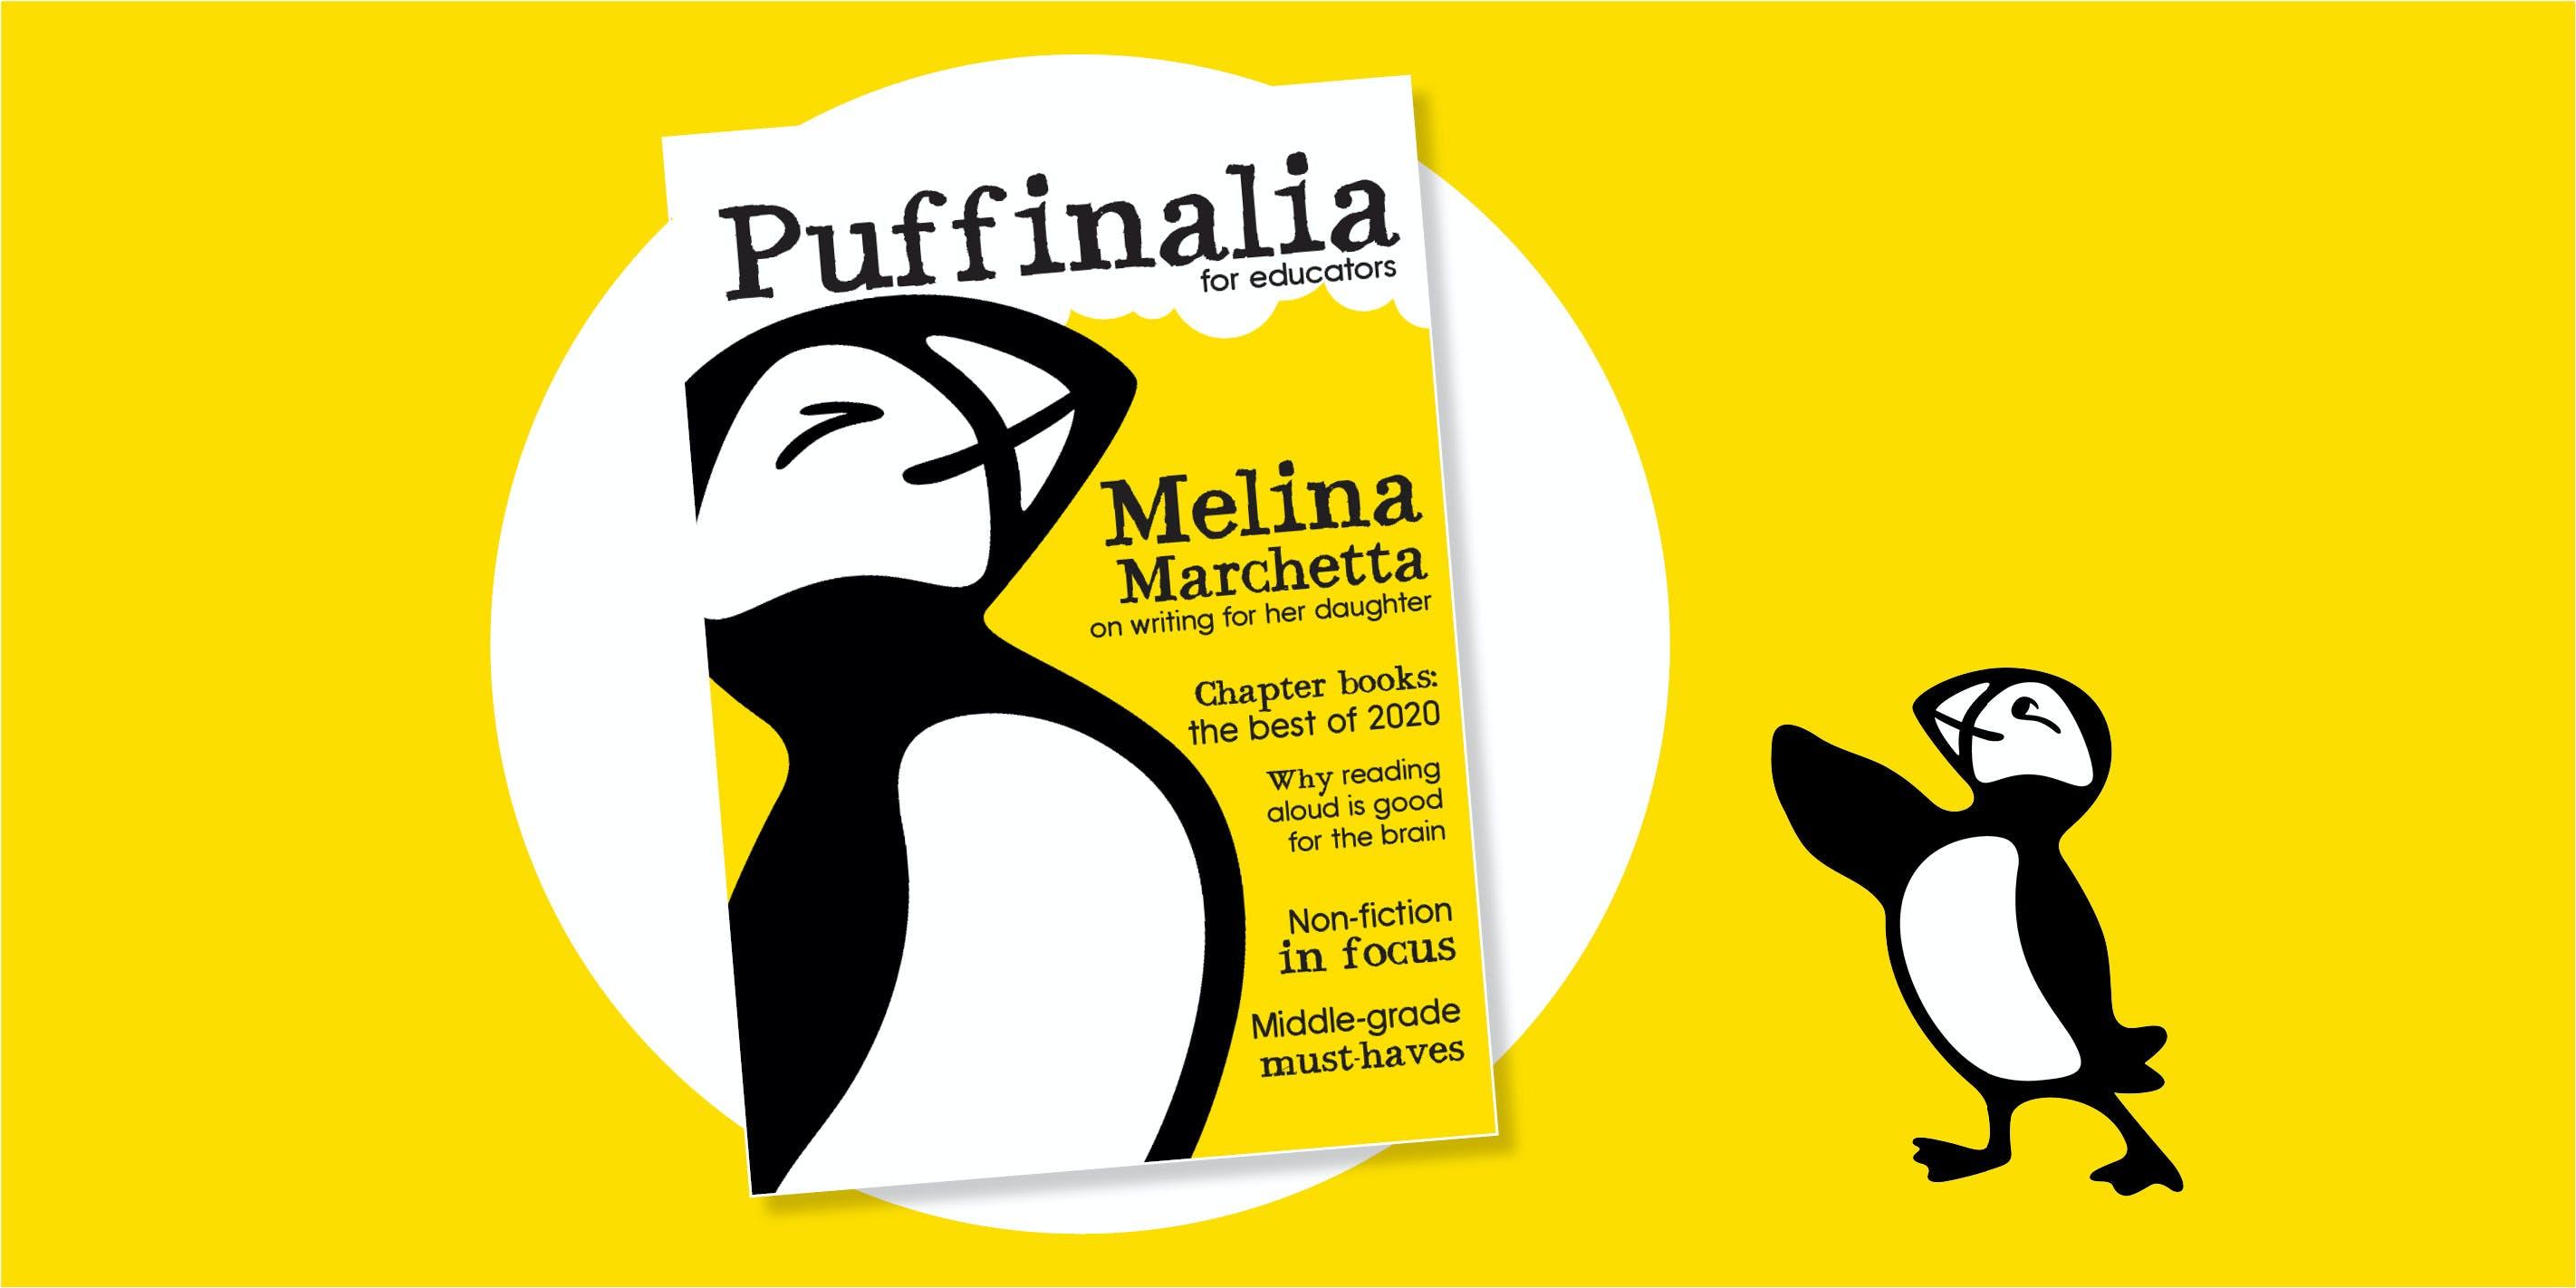 Puffinalia for educators